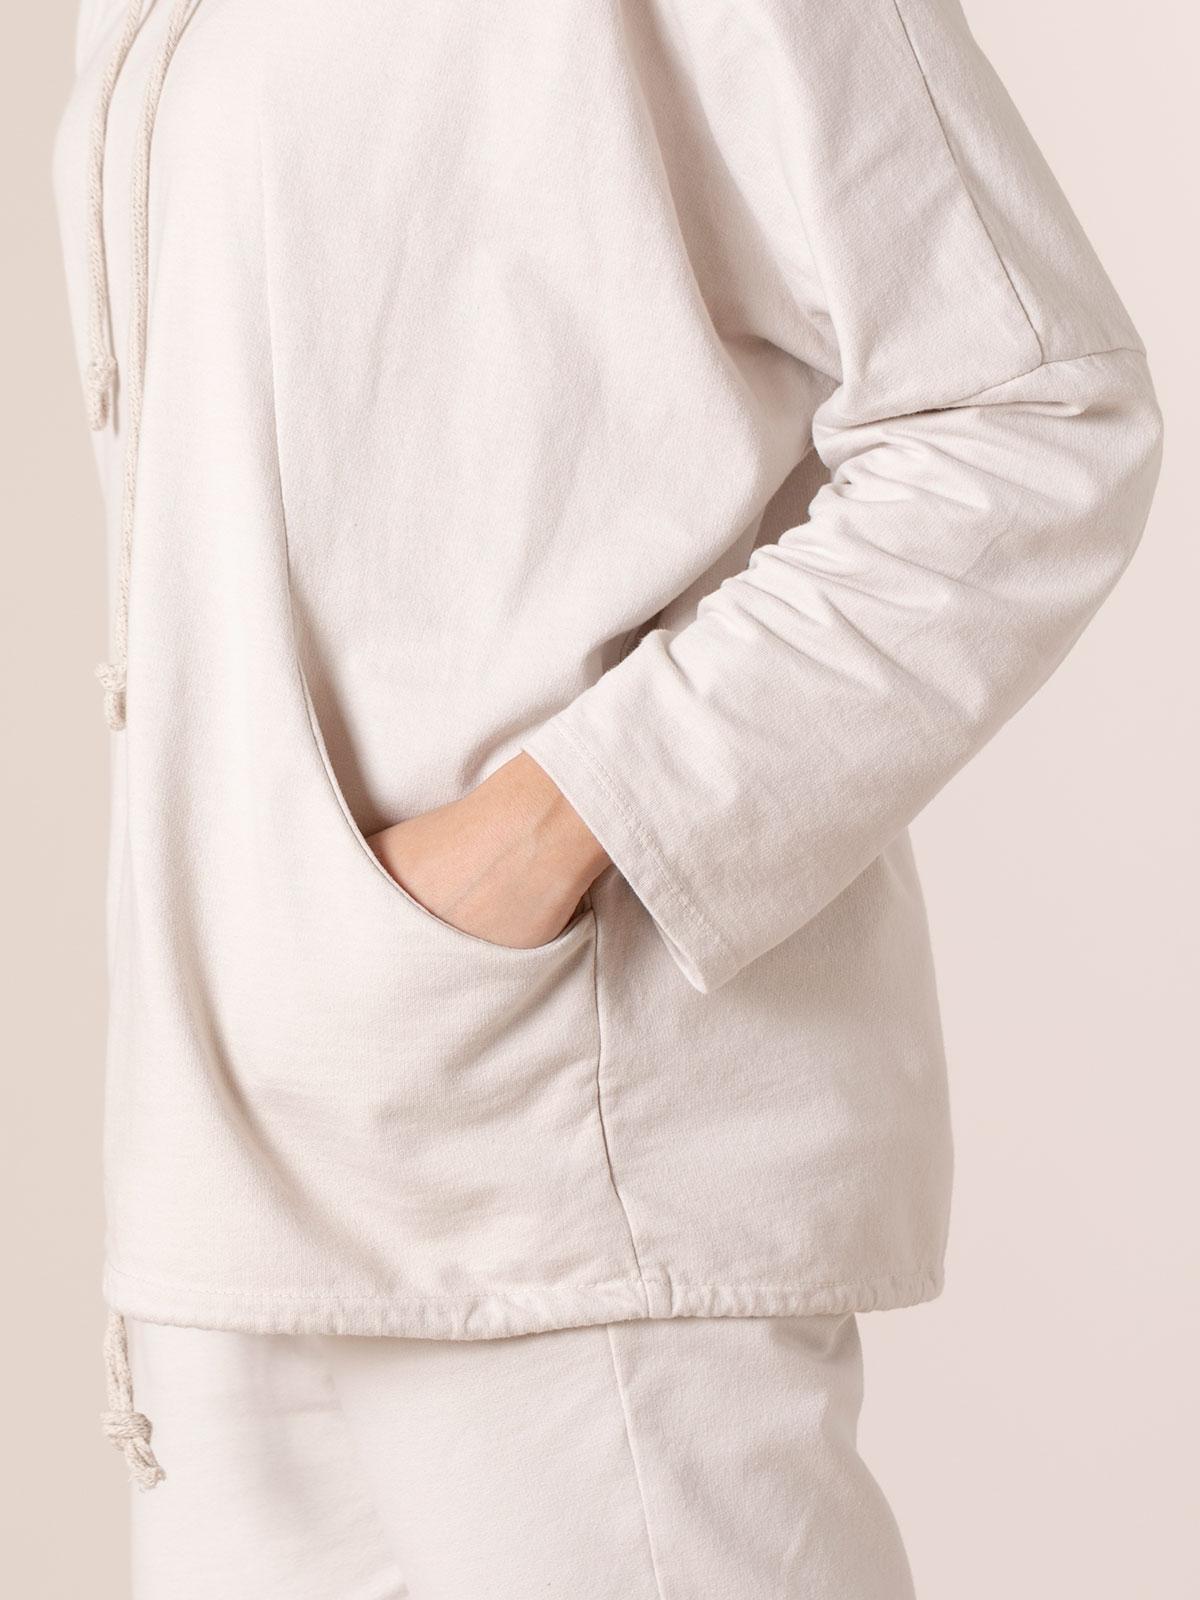 Woman Sweatshirt with pockets and hem detail Beige